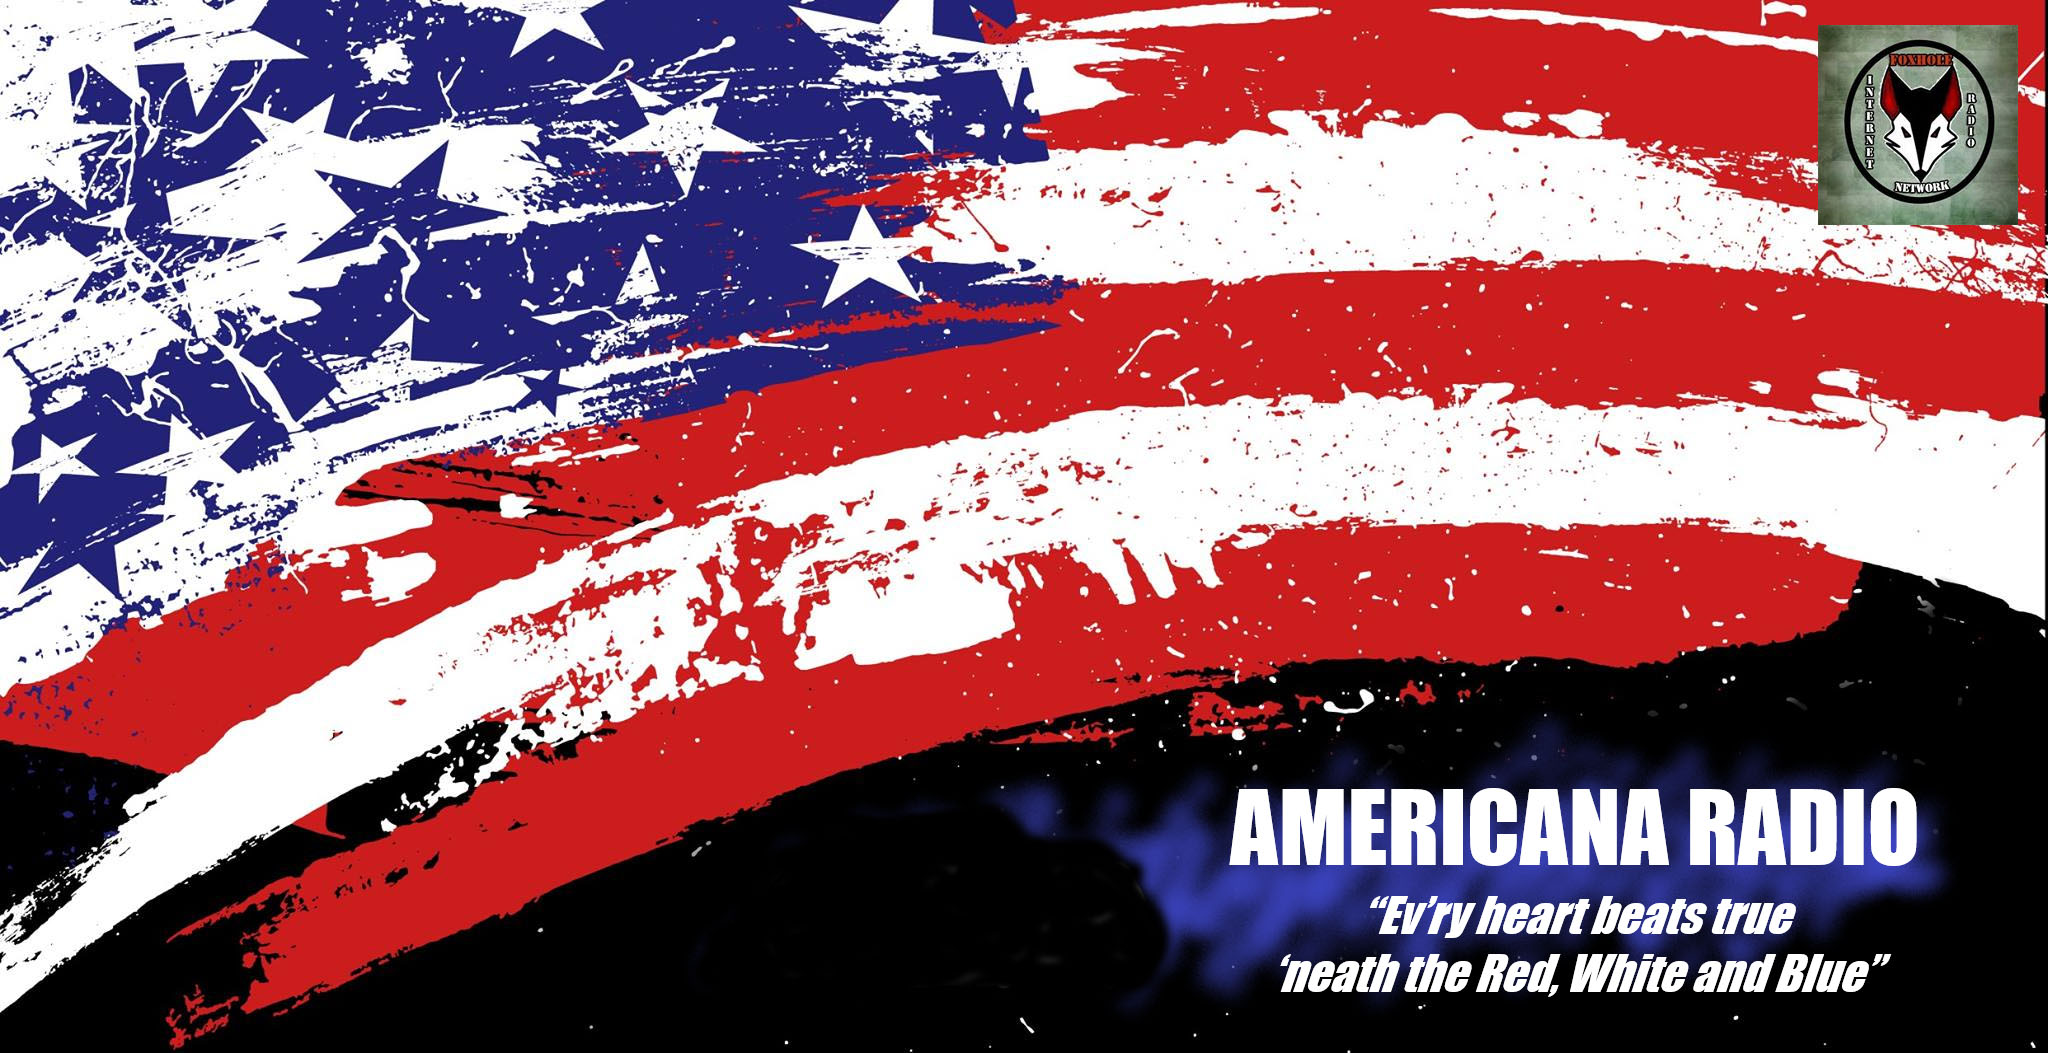 The FOXHOLE Internet Radio Station - Americana